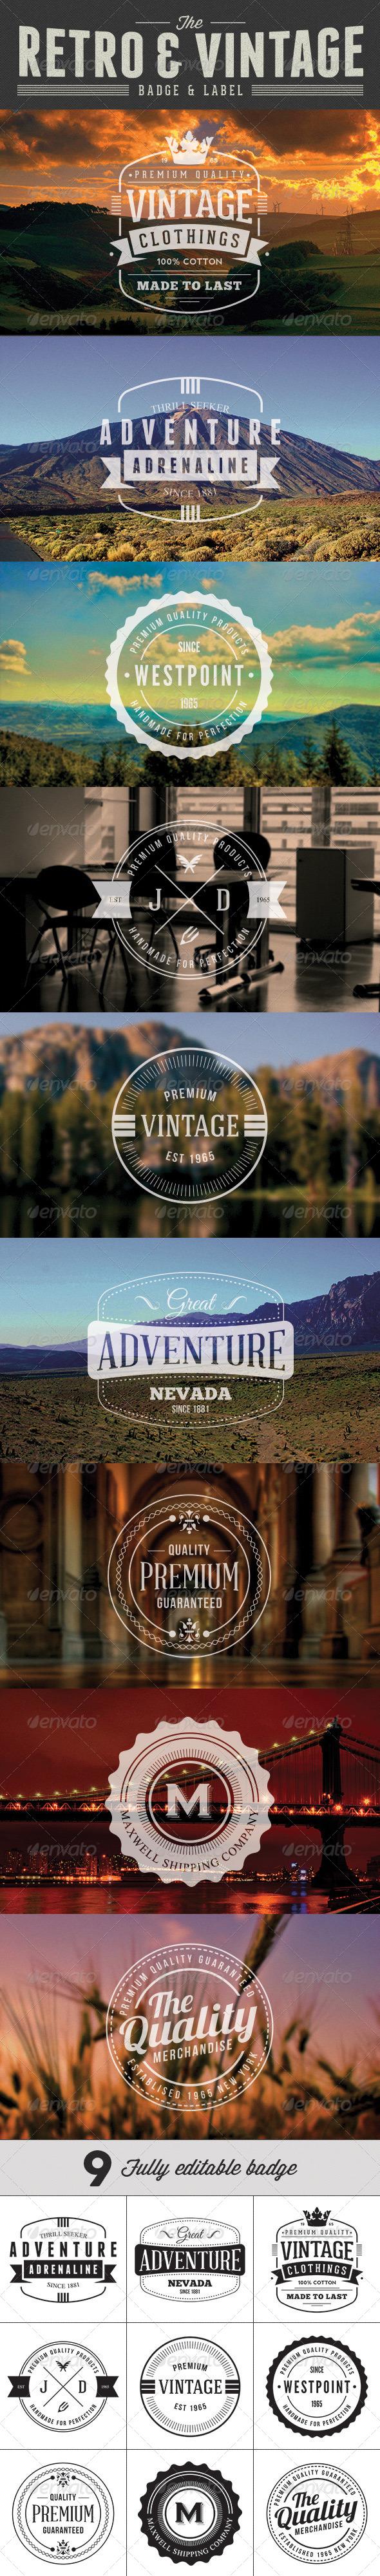 Retro Vintage Badge & Label - Badges & Stickers Web Elements